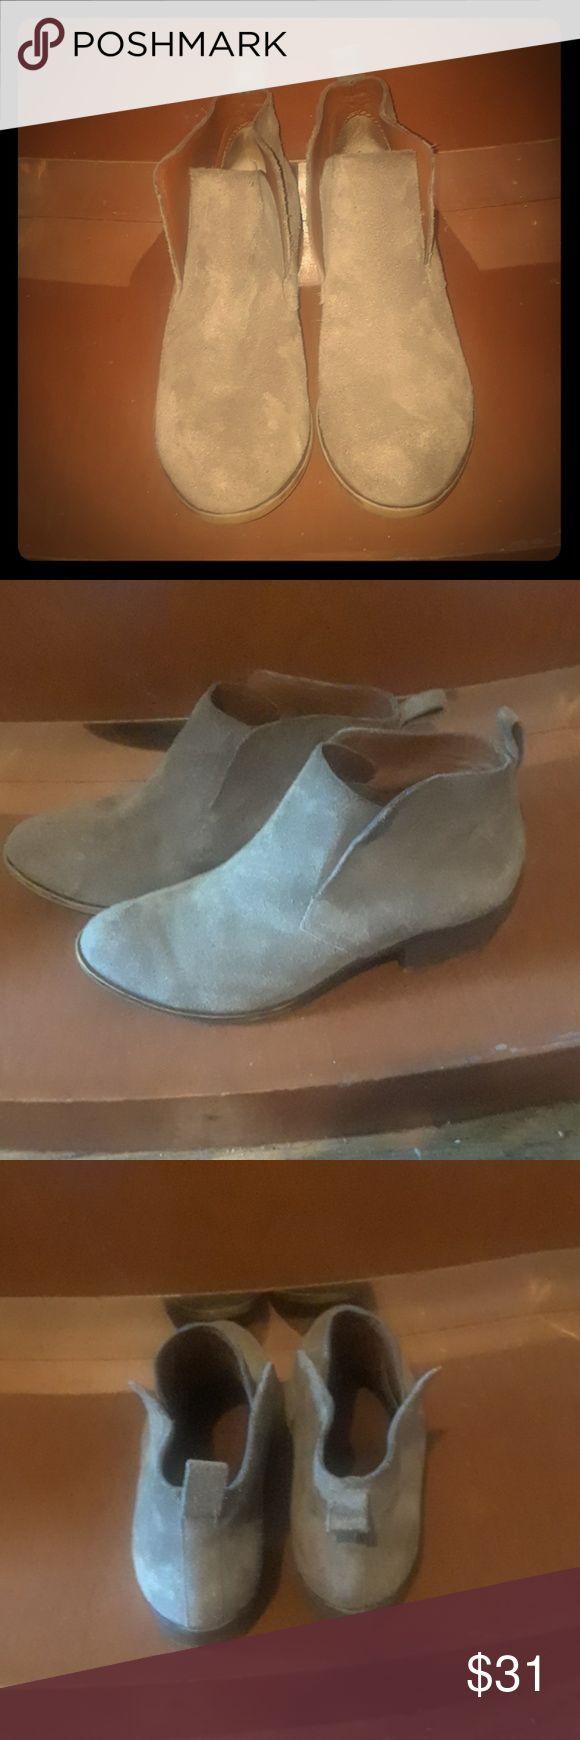 3f56d20fd953 Lucky Brand Womens booties size 6.5 m Slip on